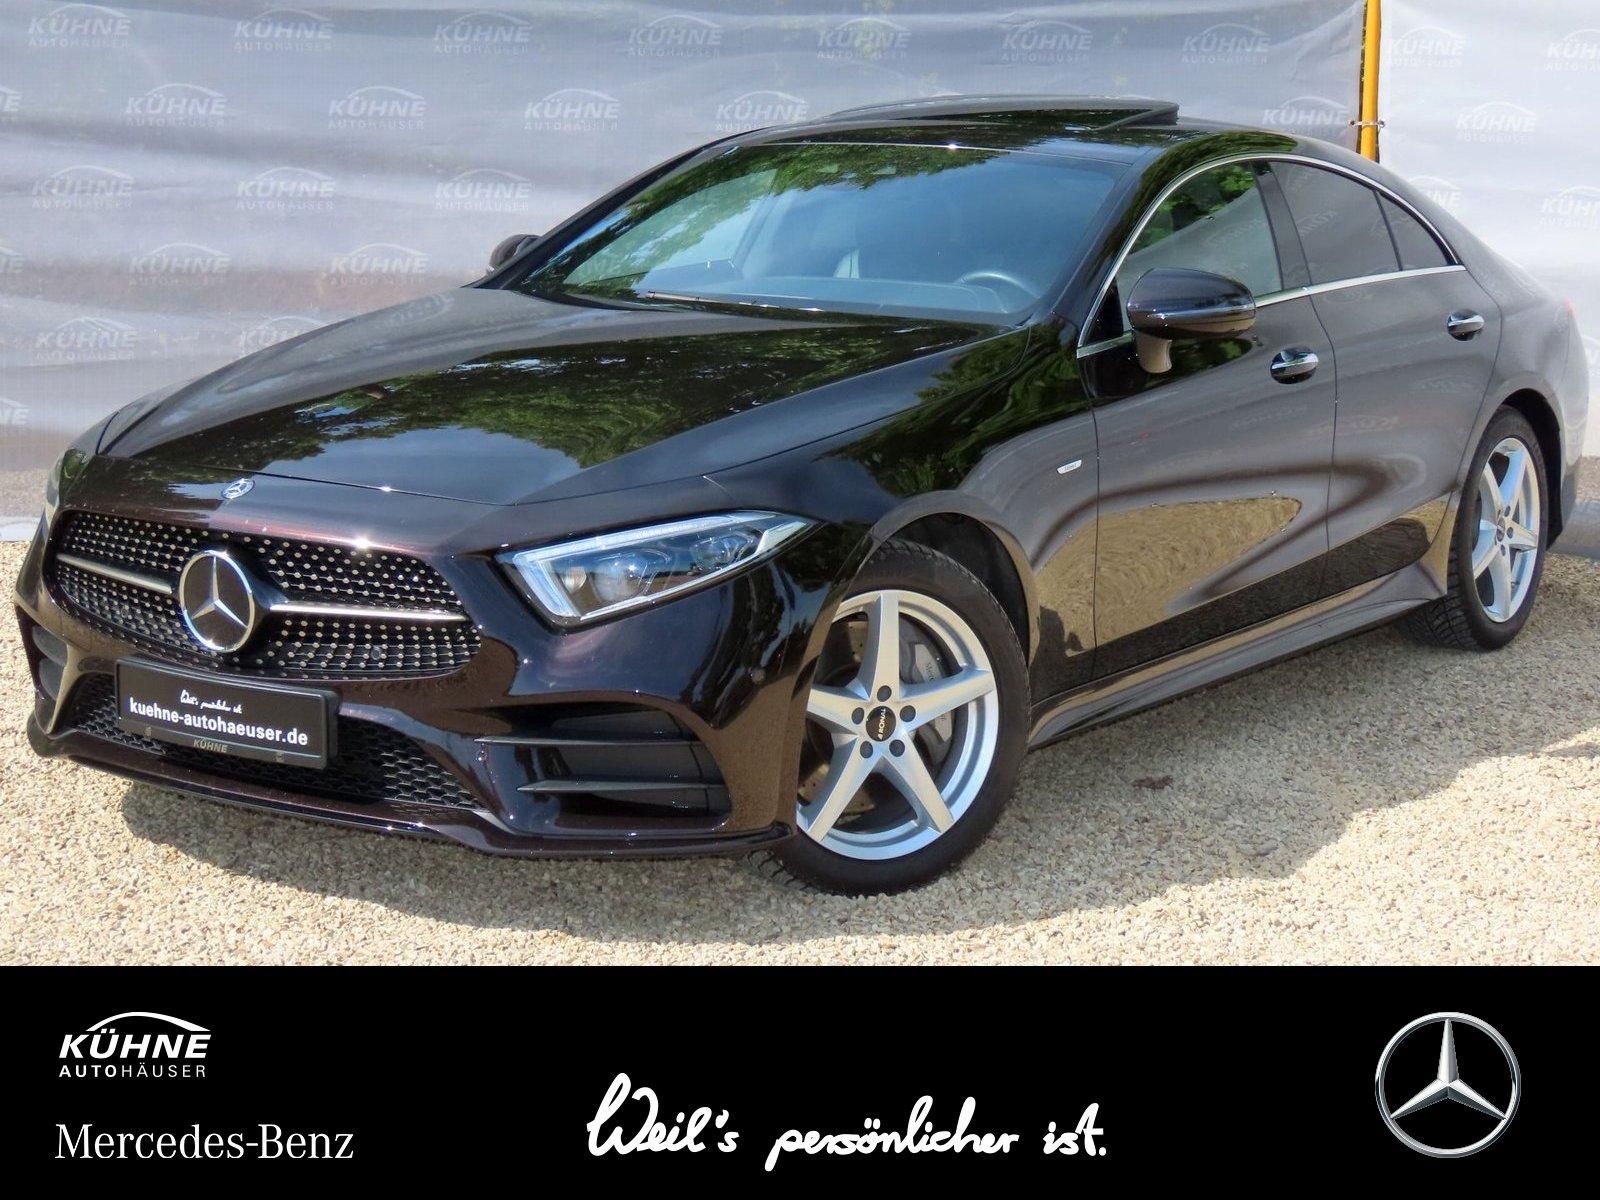 Mercedes-Benz Mercedes-Benz CLS 450 AMG Edition 1 Widescreen, Jahr 2019, Benzin